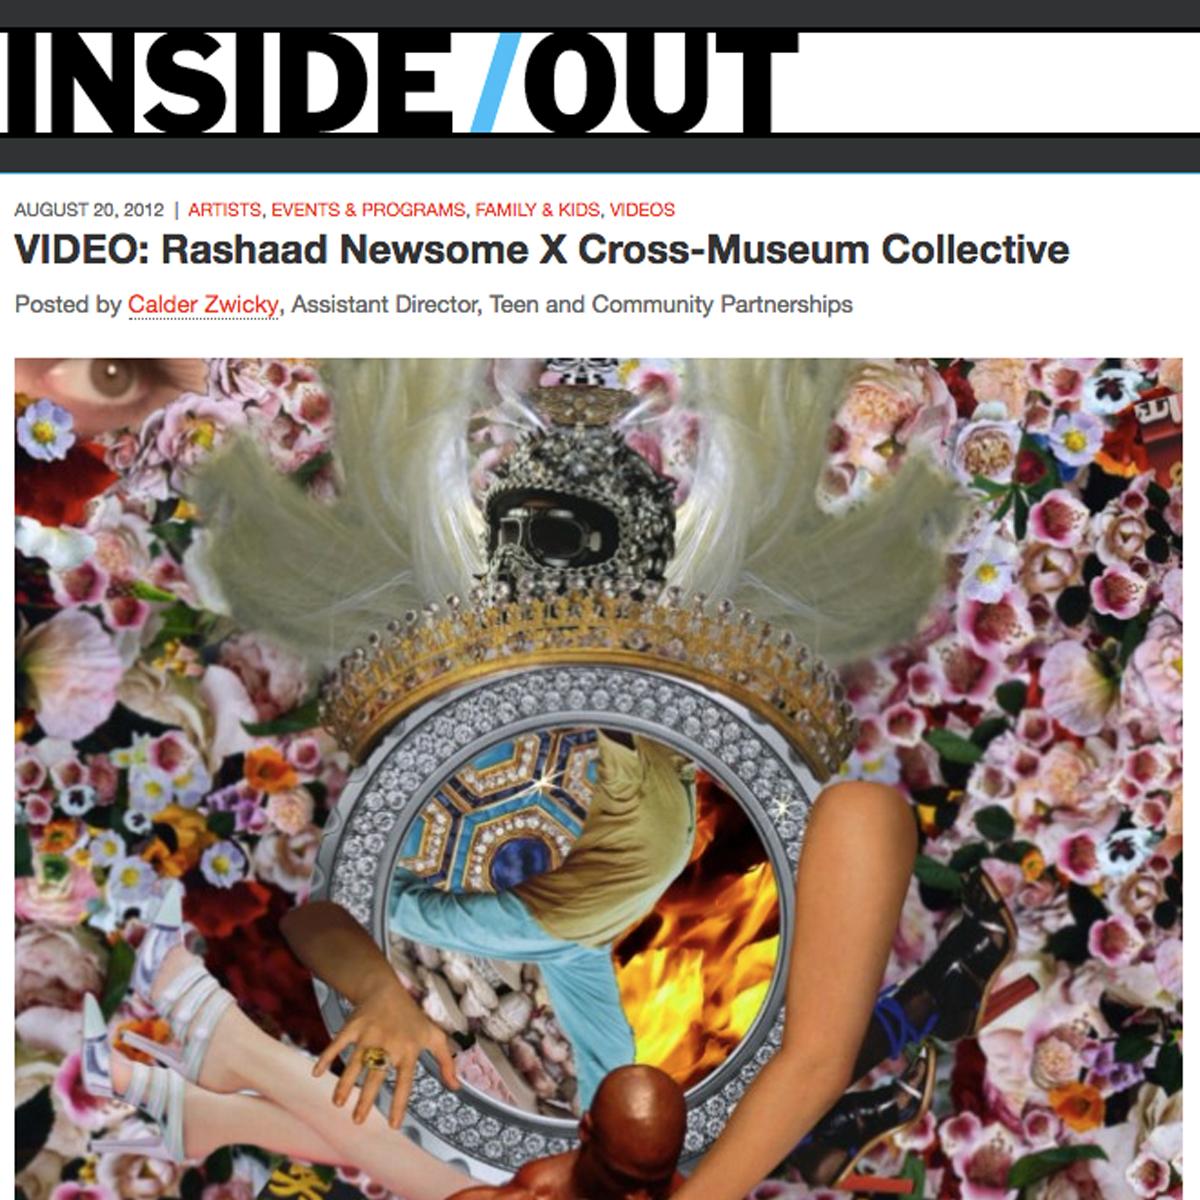 Rashaad Newsome X Cross-Museum Collective